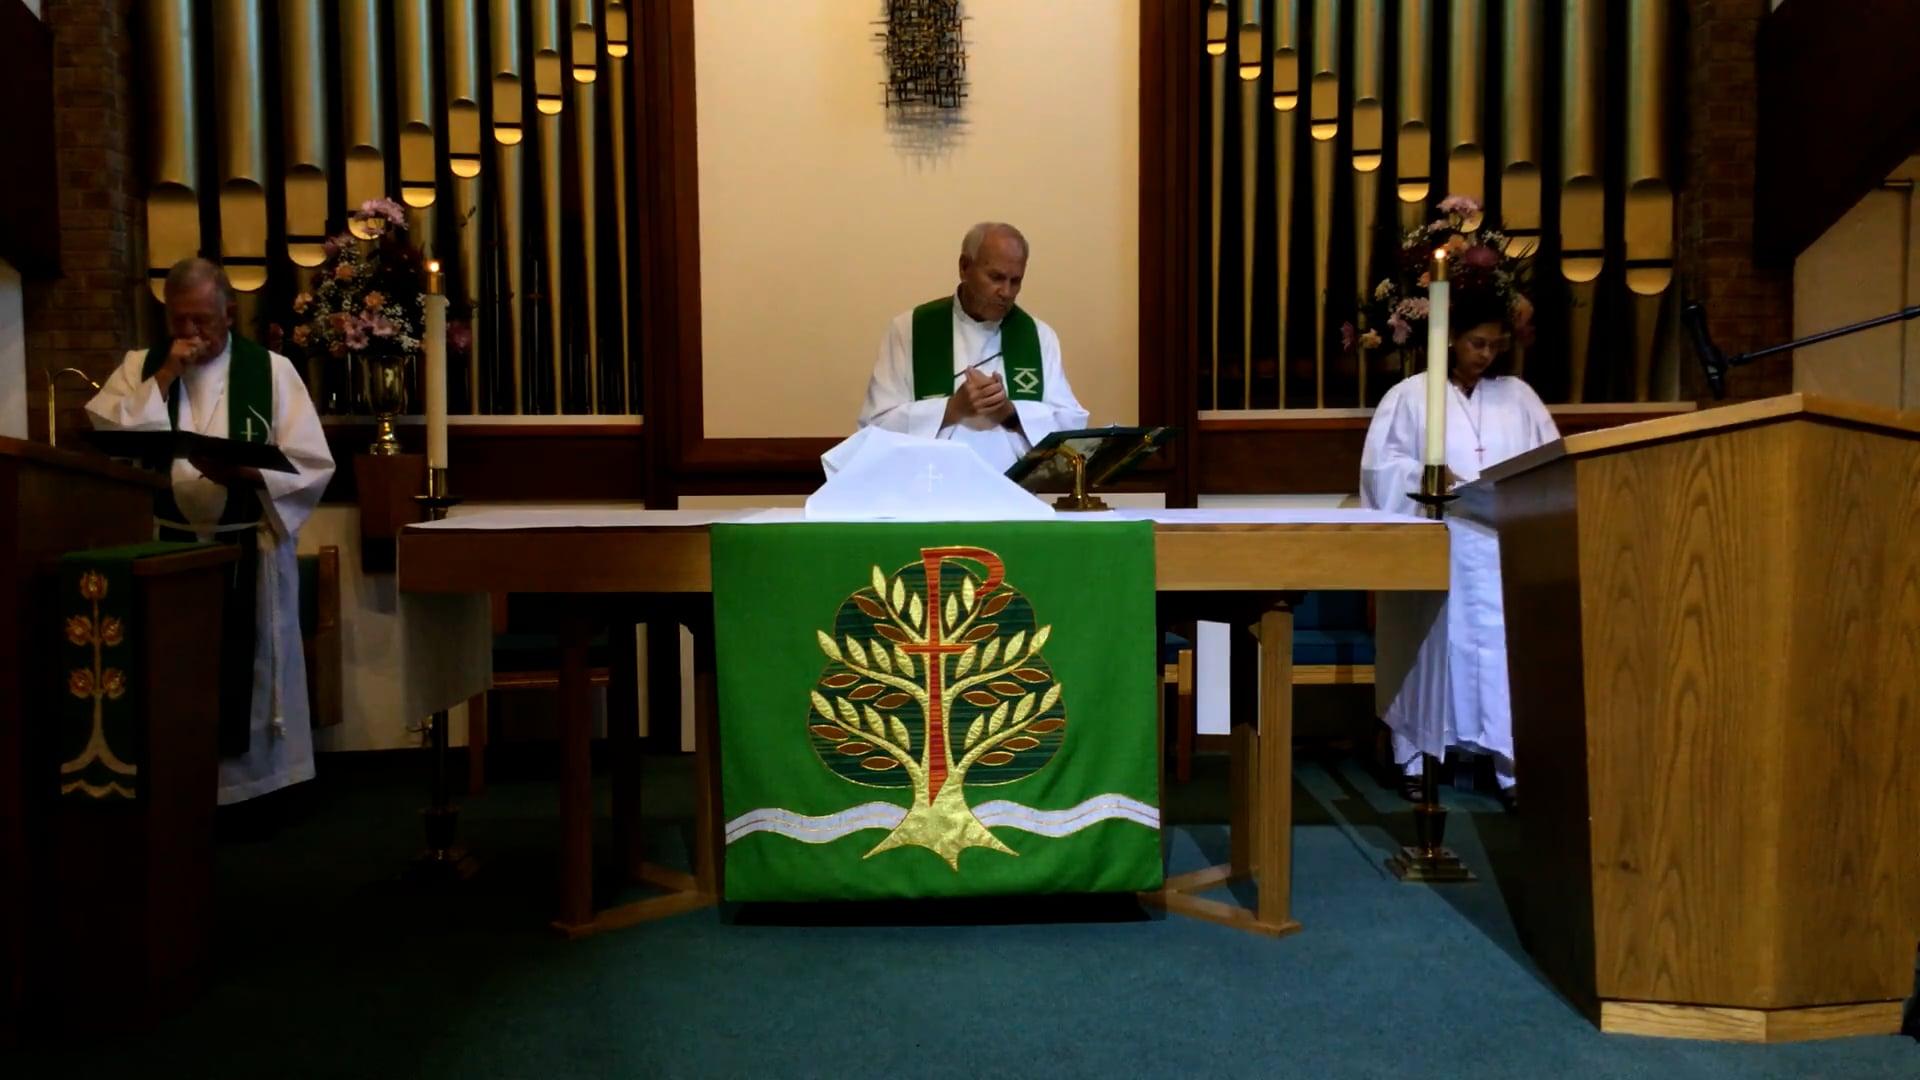 FLC Worship Service - Sept. 5, 2021